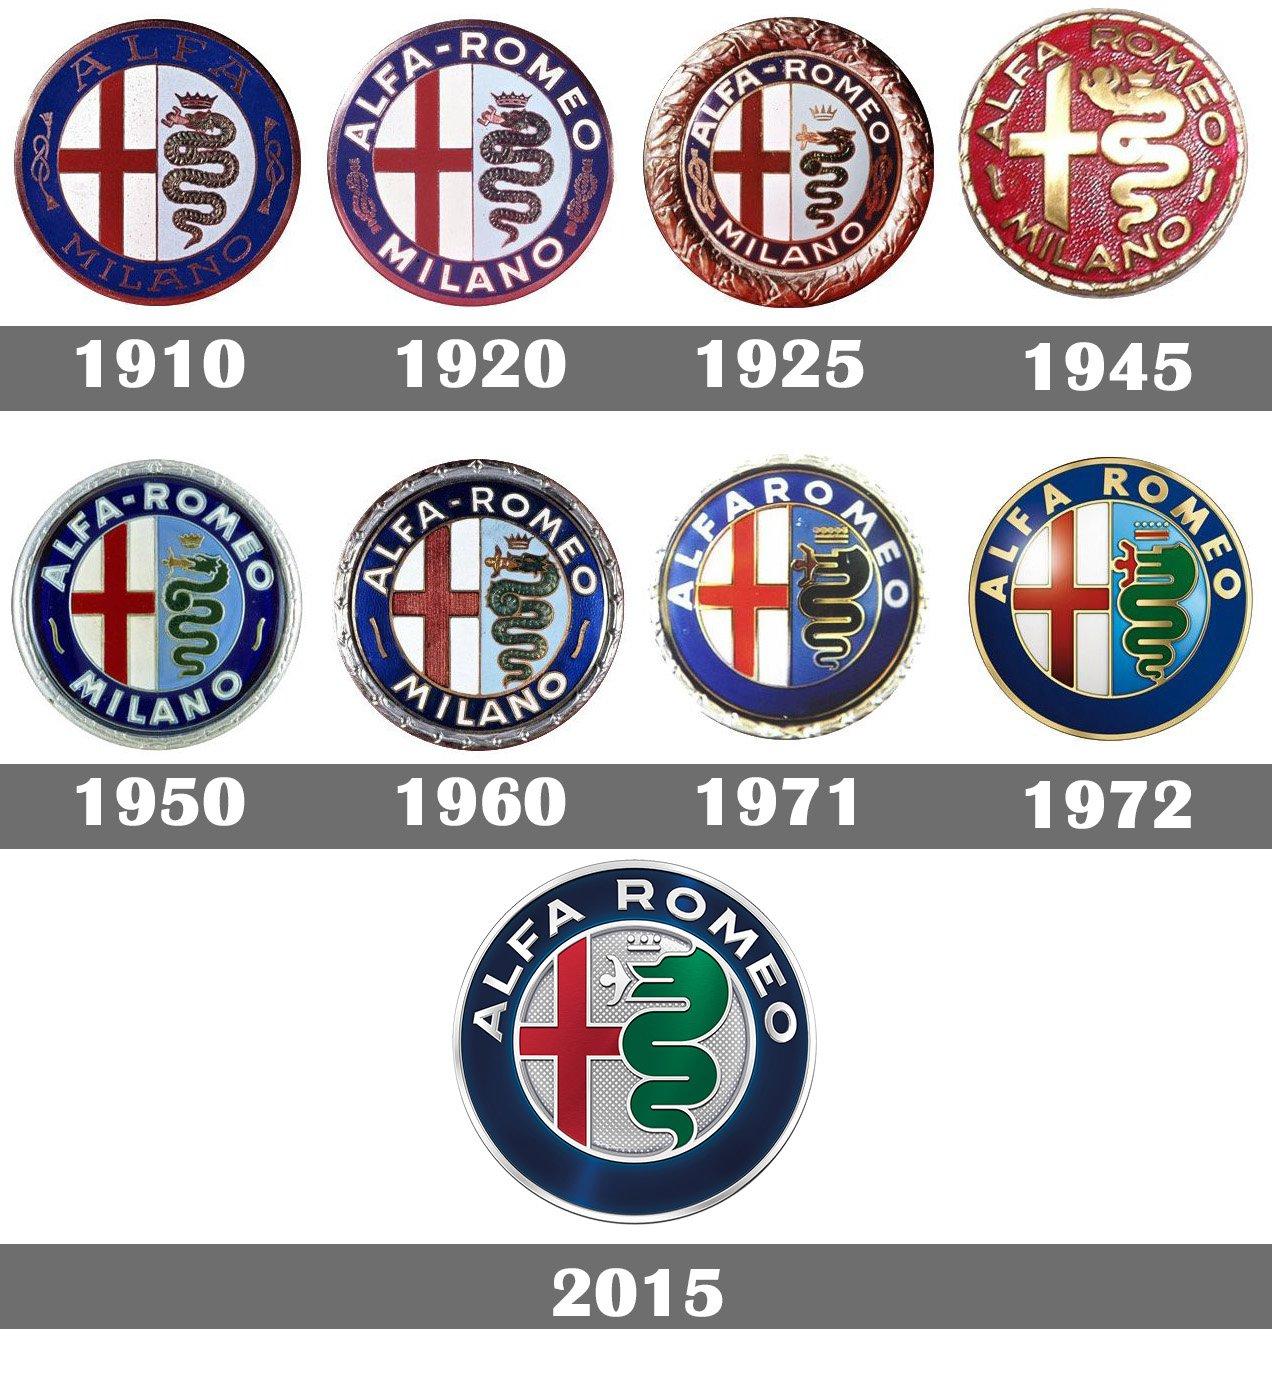 alfa romeo logo, symbol, meaning, history and evolution.